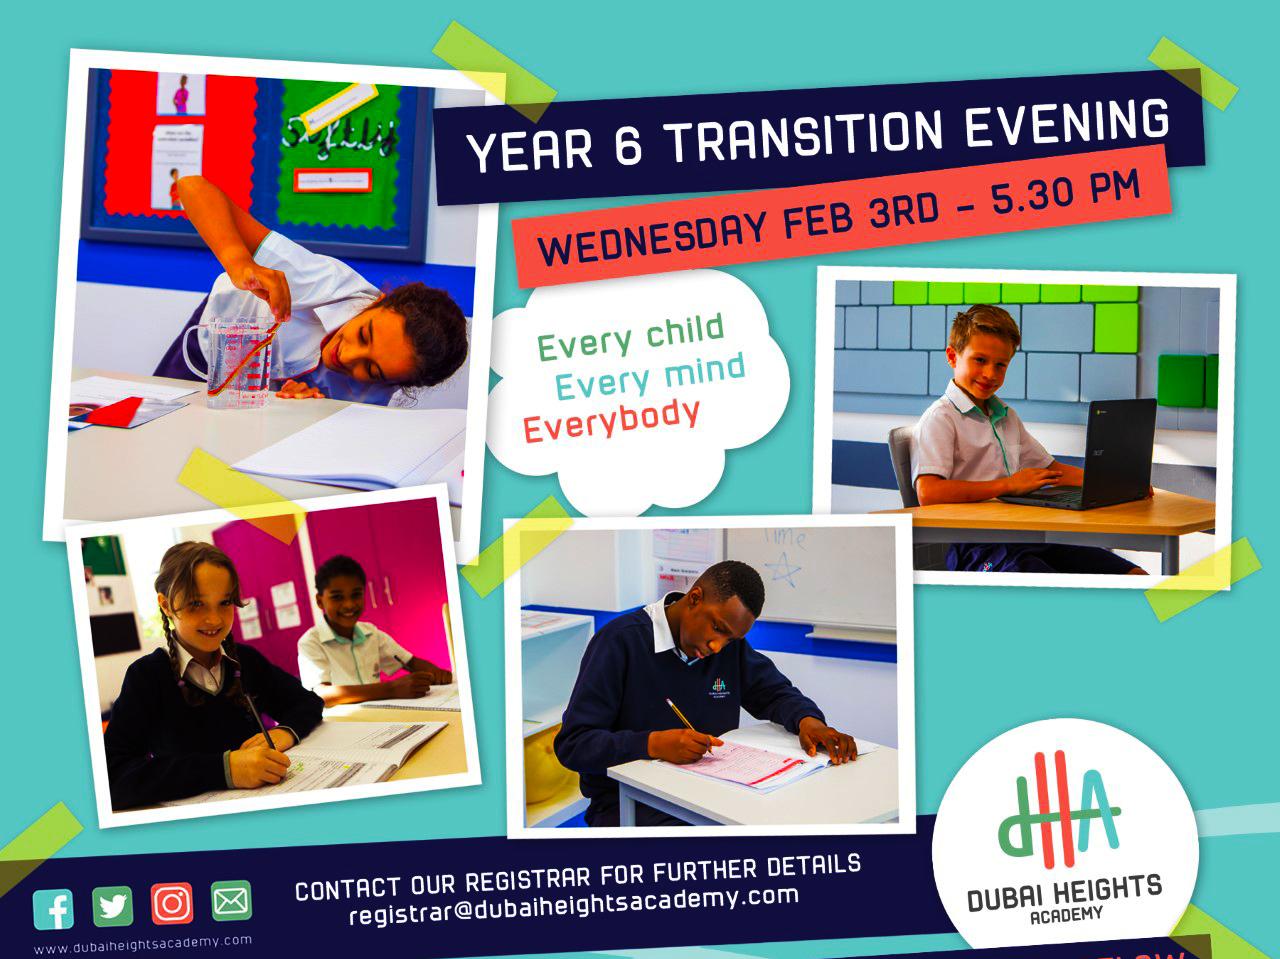 Dubai Heights Academy Jahr 6 Transition Event 2021